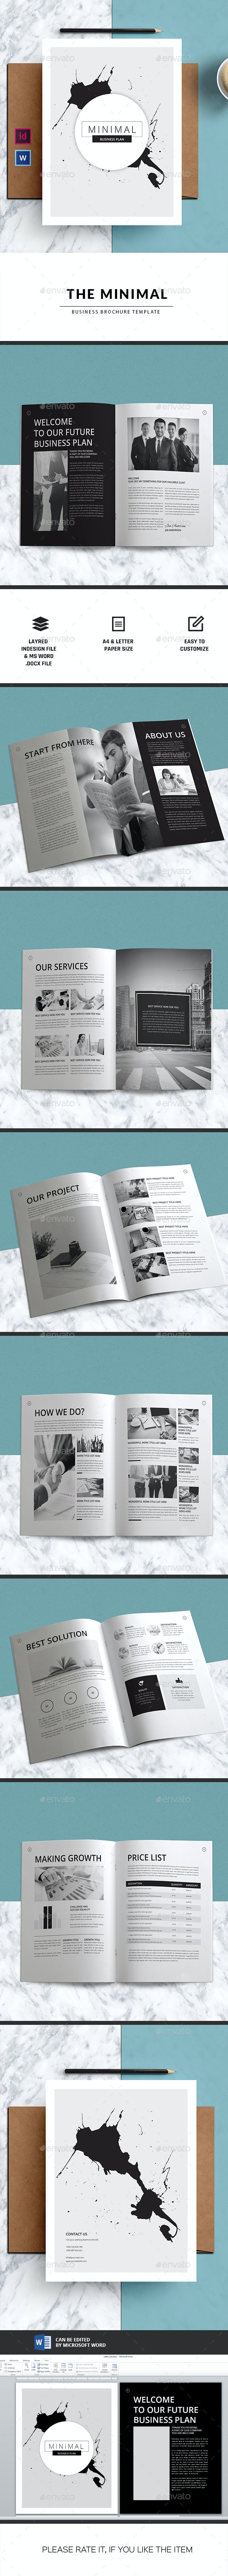 MINIMAL   Business Brochure-Indesign Template - Corporate Brochures